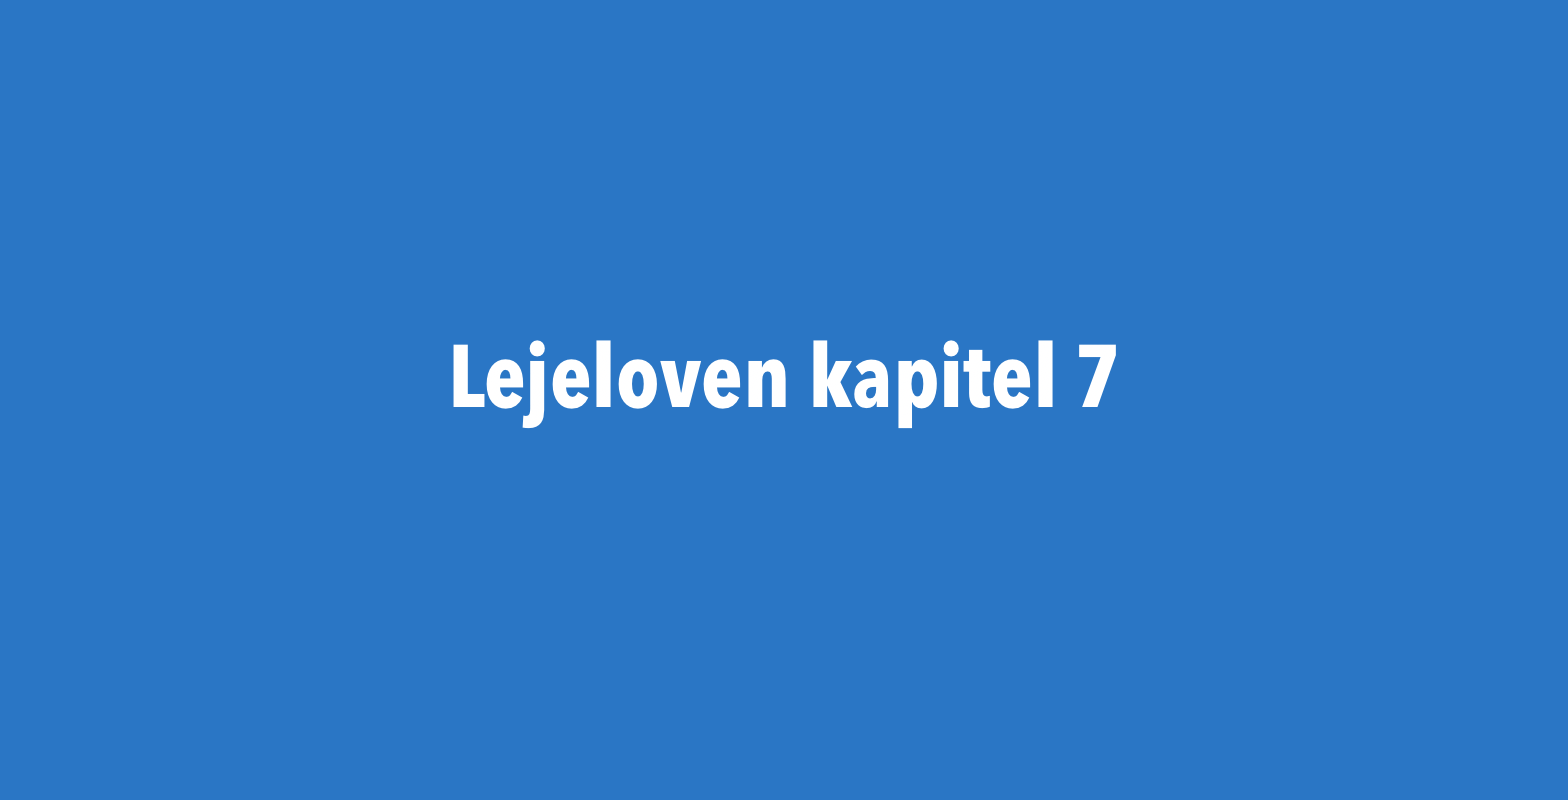 Lejelovens kapital 7